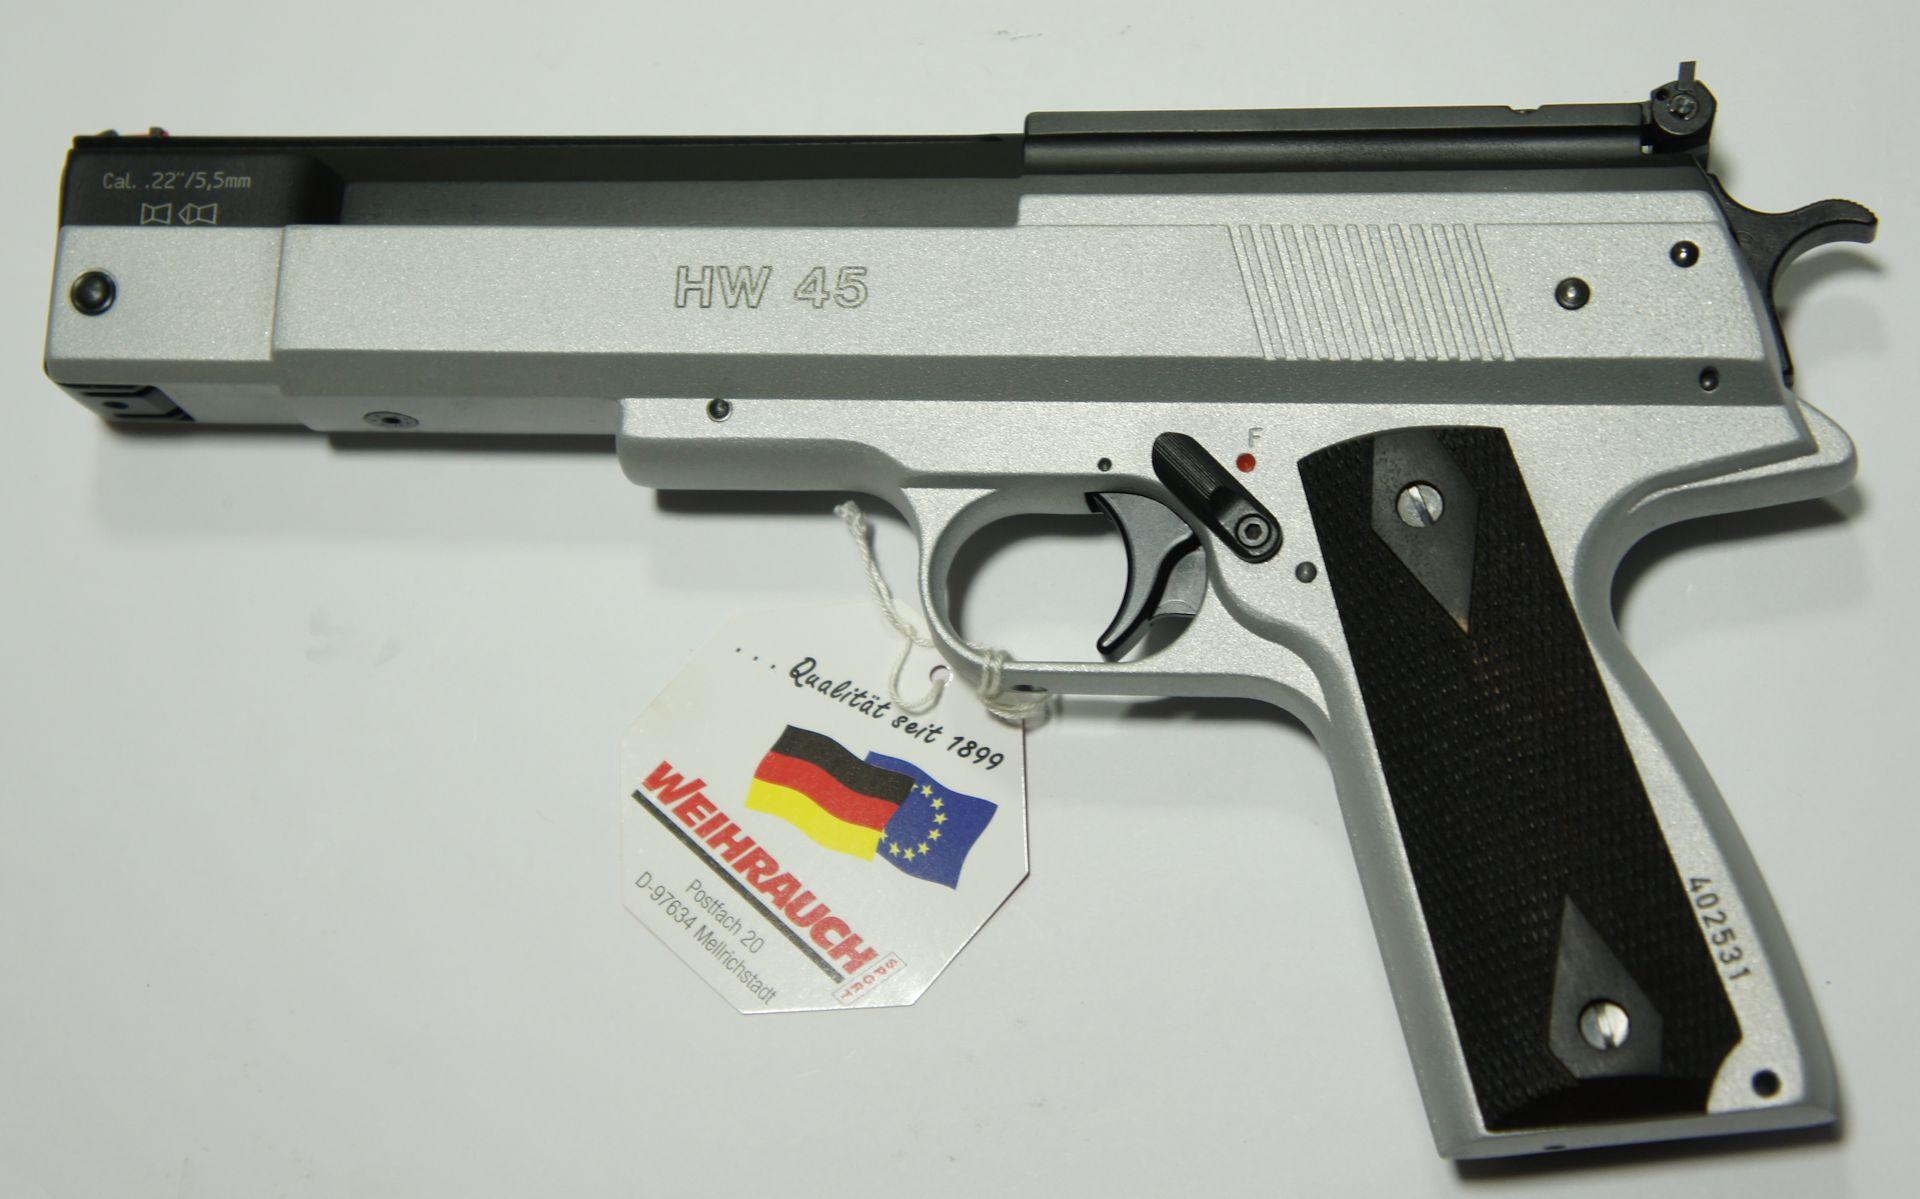 Luftpistole HW 45 Kaliber 5,5mm Silberfinish